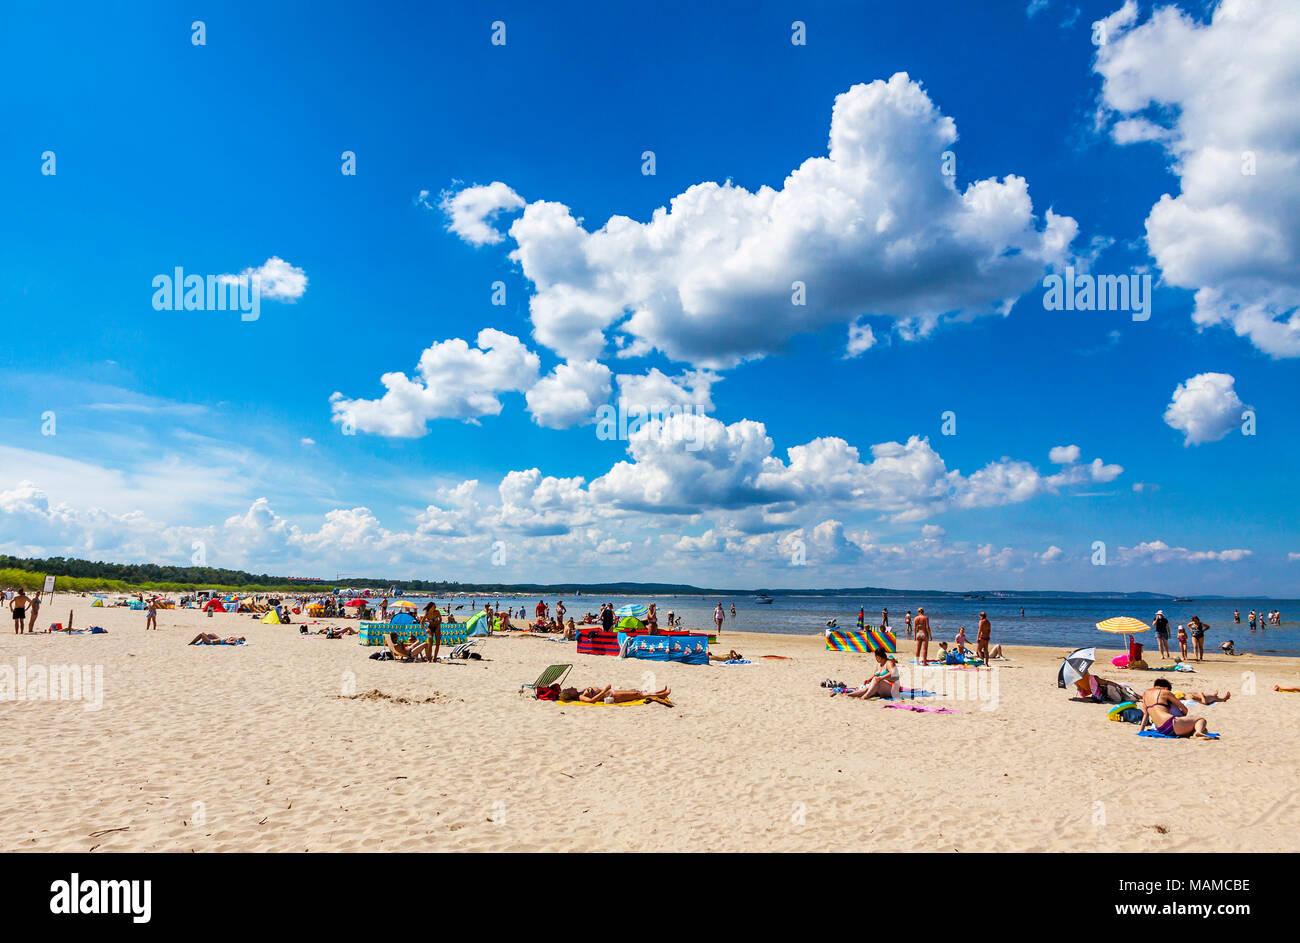 Panoramic view of crowded Baltic sea beach on Usedom island in Swinoujscie, Poland Stock Photo